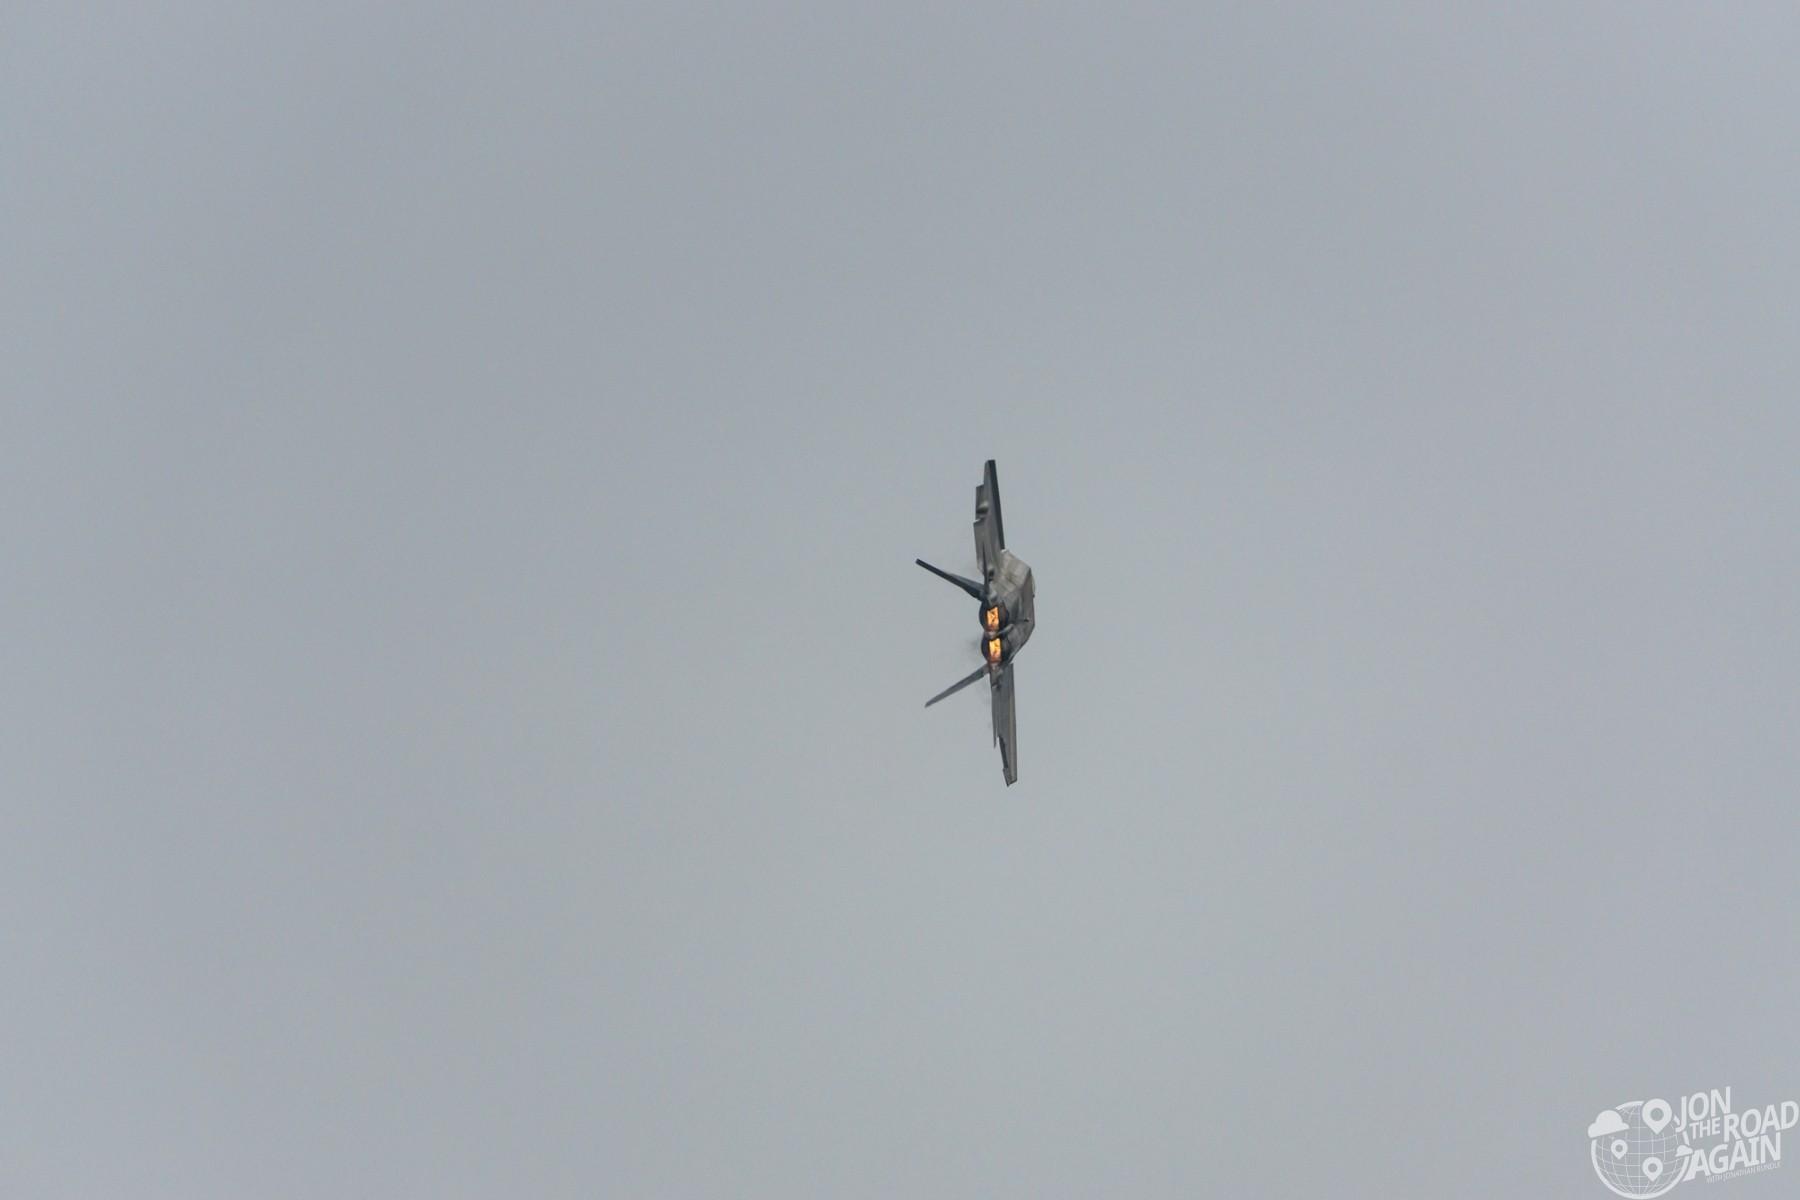 Seafair F22 Raptor